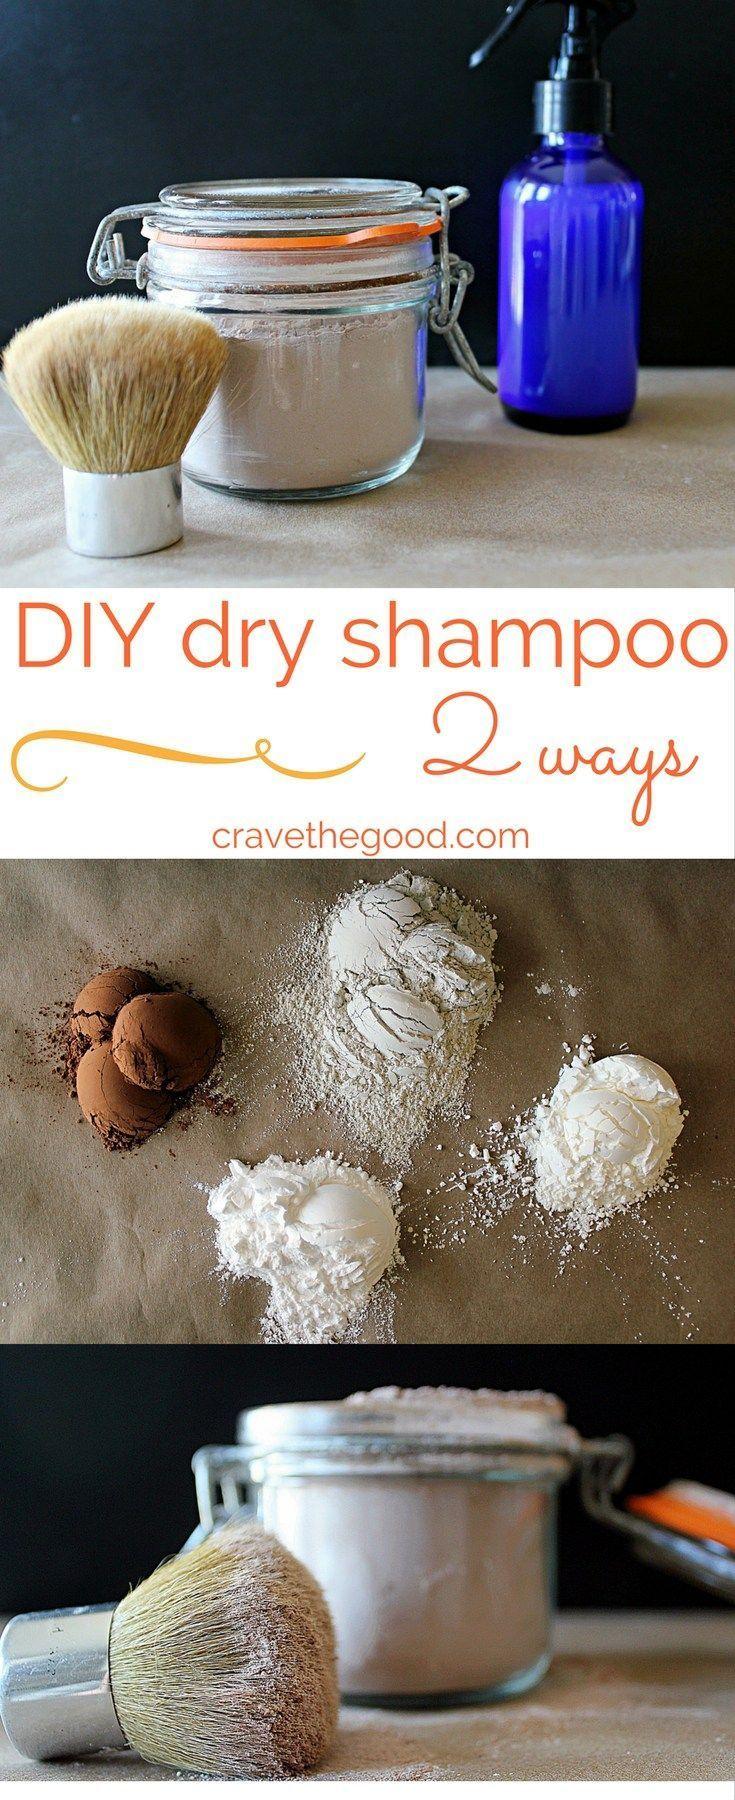 Dry Shampoo - 2 Ways. Homemade dry powder shampoo and spray dry shampoo that really works, at a fraction of the cost!   cravethegood.com